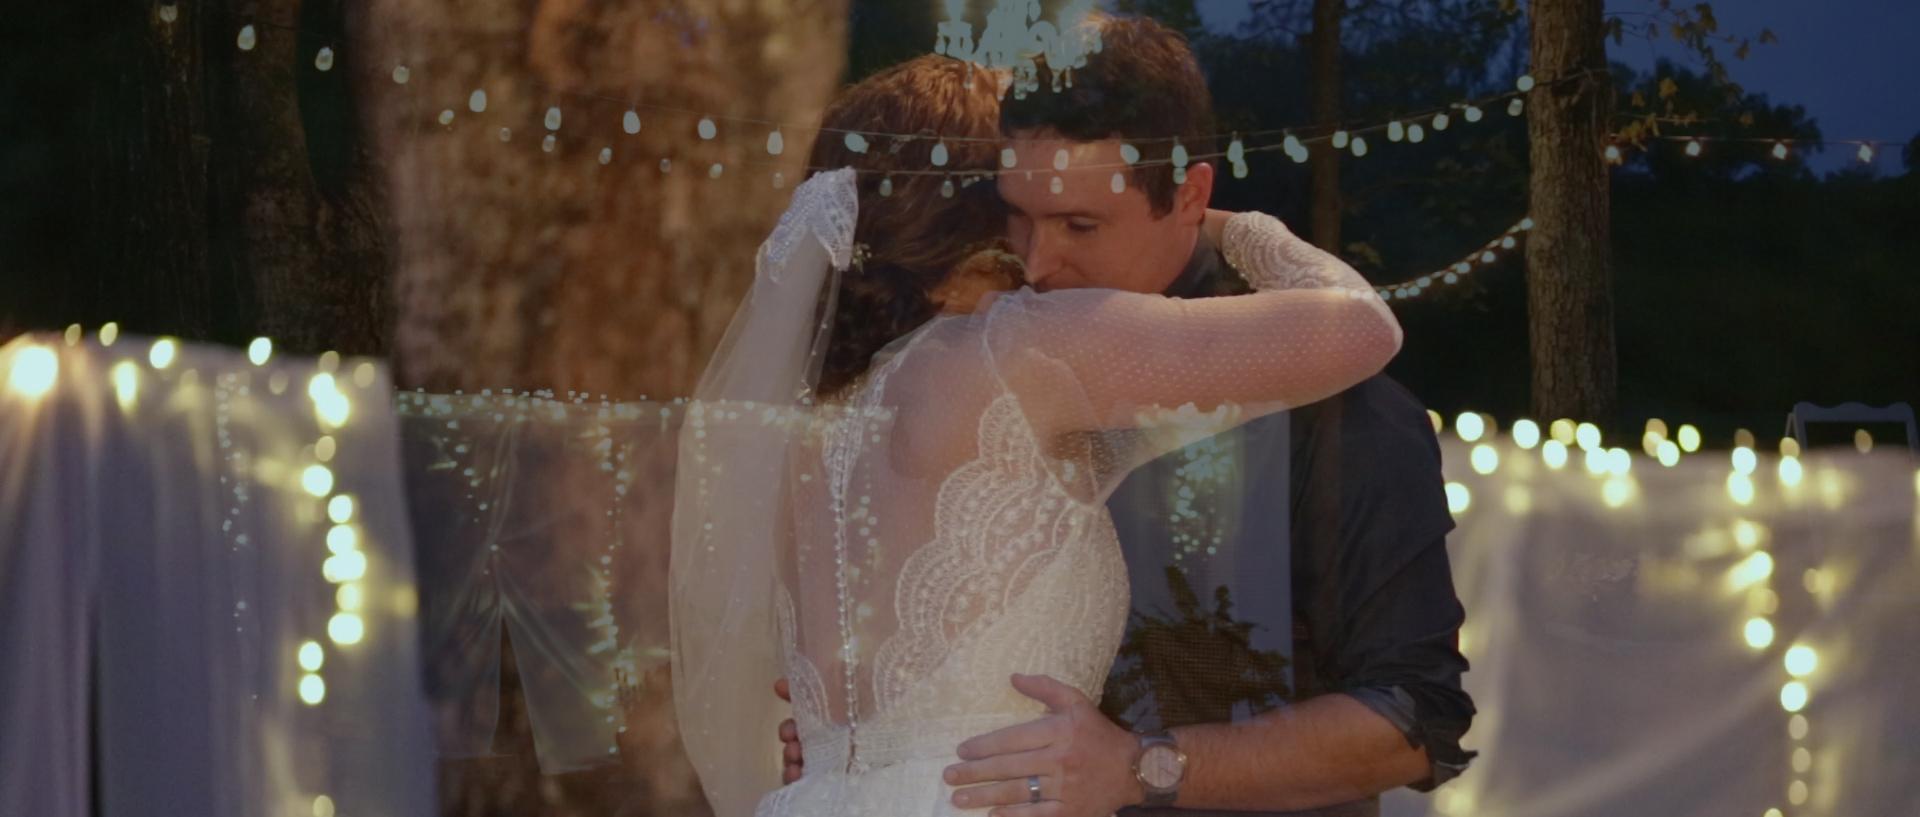 josee-corey-wedding-dance-reception-amavi-films-memphis-wedding-videography.jpg